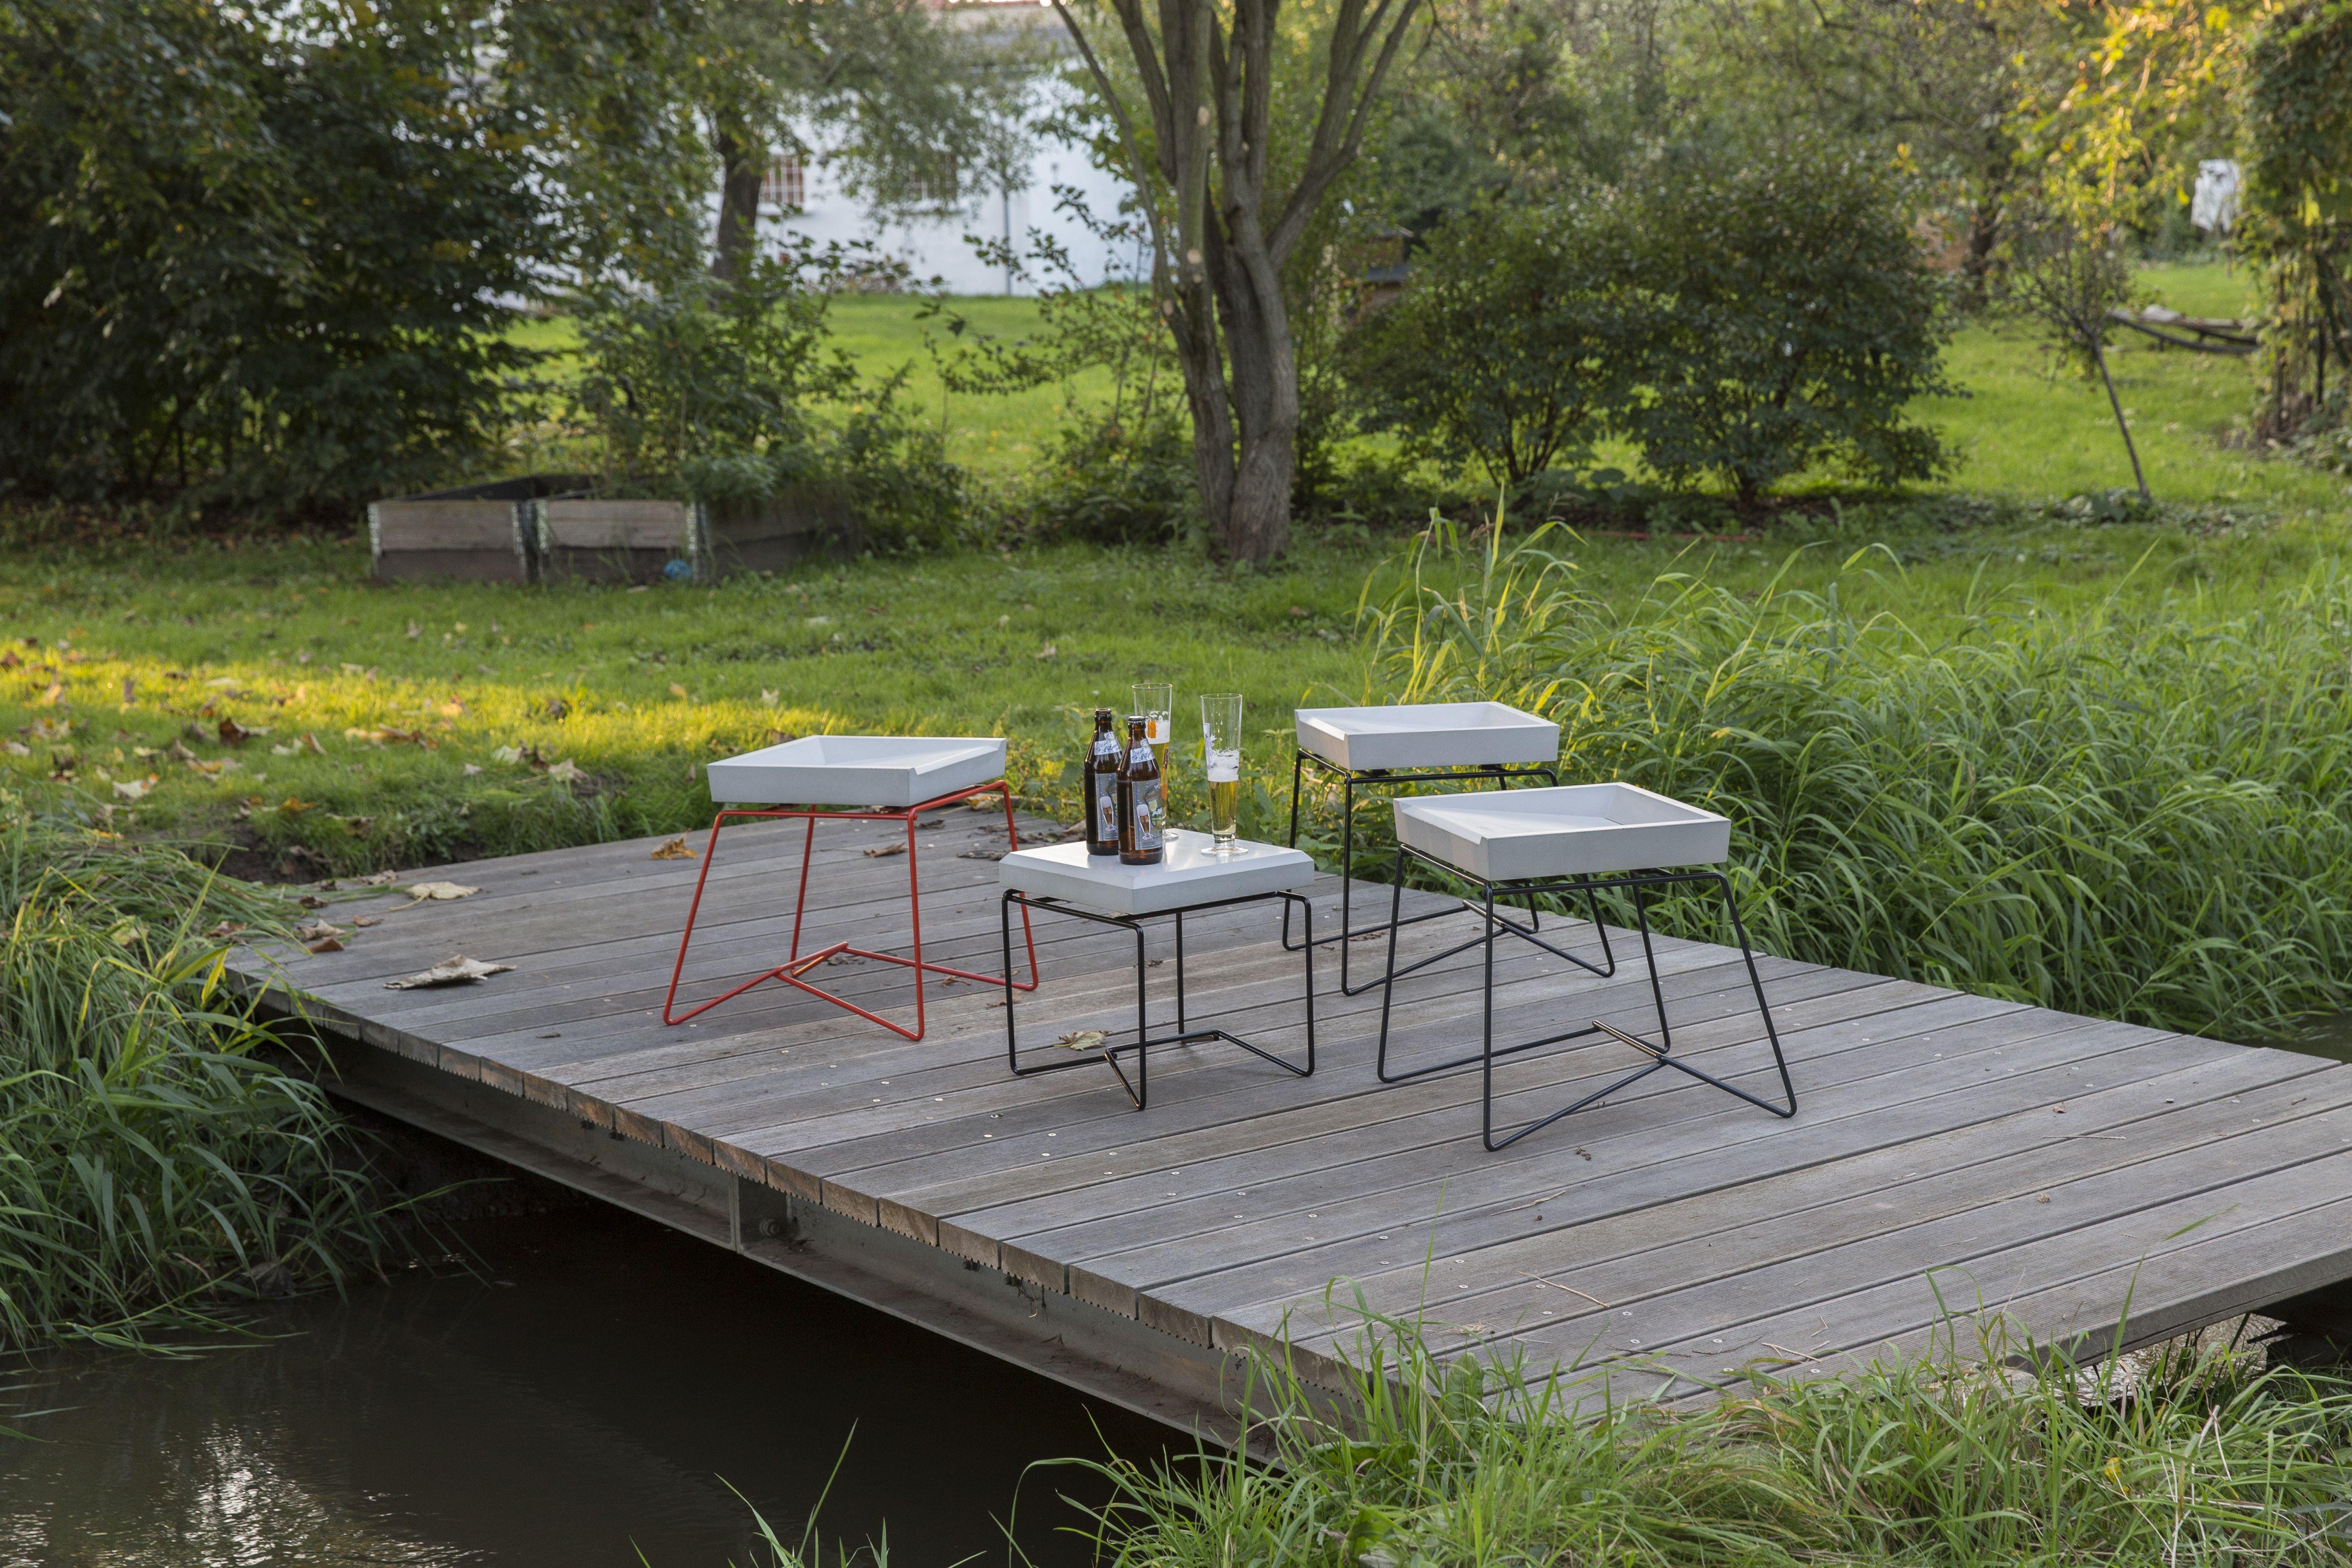 betonhocker, betontisch, betonstuhl, garten, terrasse, design, Gartenarbeit ideen